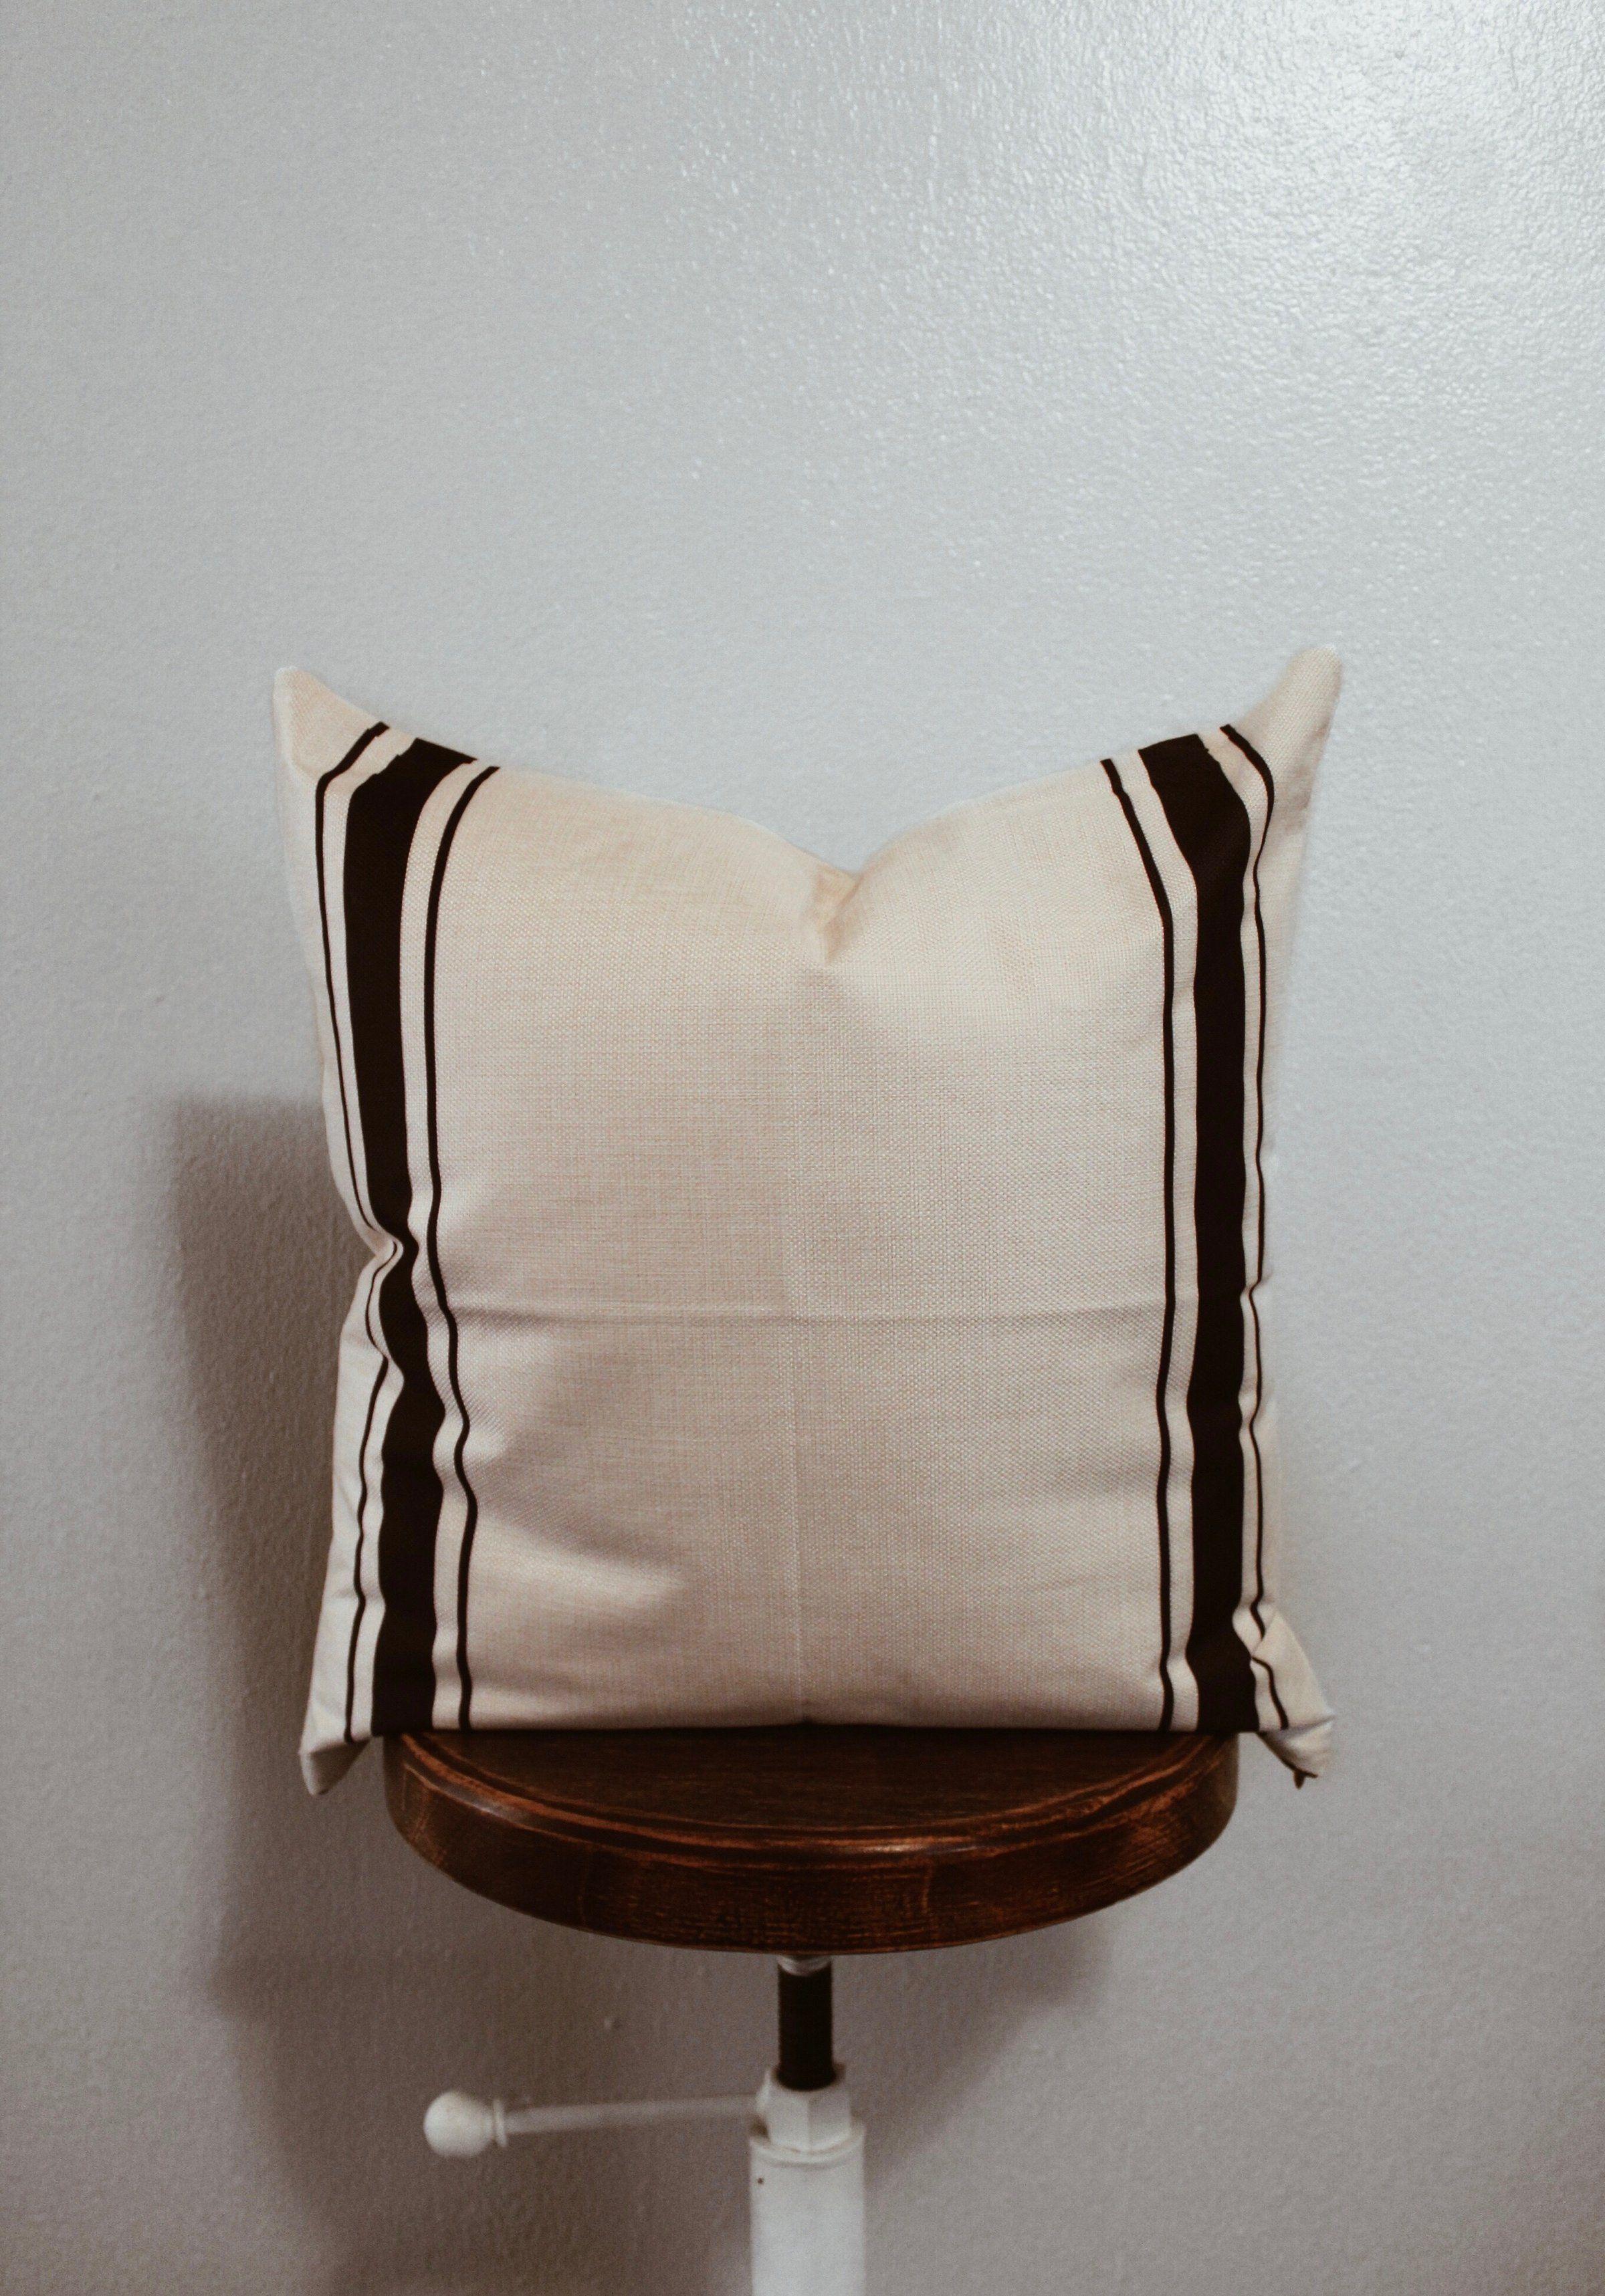 Black Grain Stripe Pillow Covers  Black Grain Stripe Pillow Covers  The Southern Jarring Co